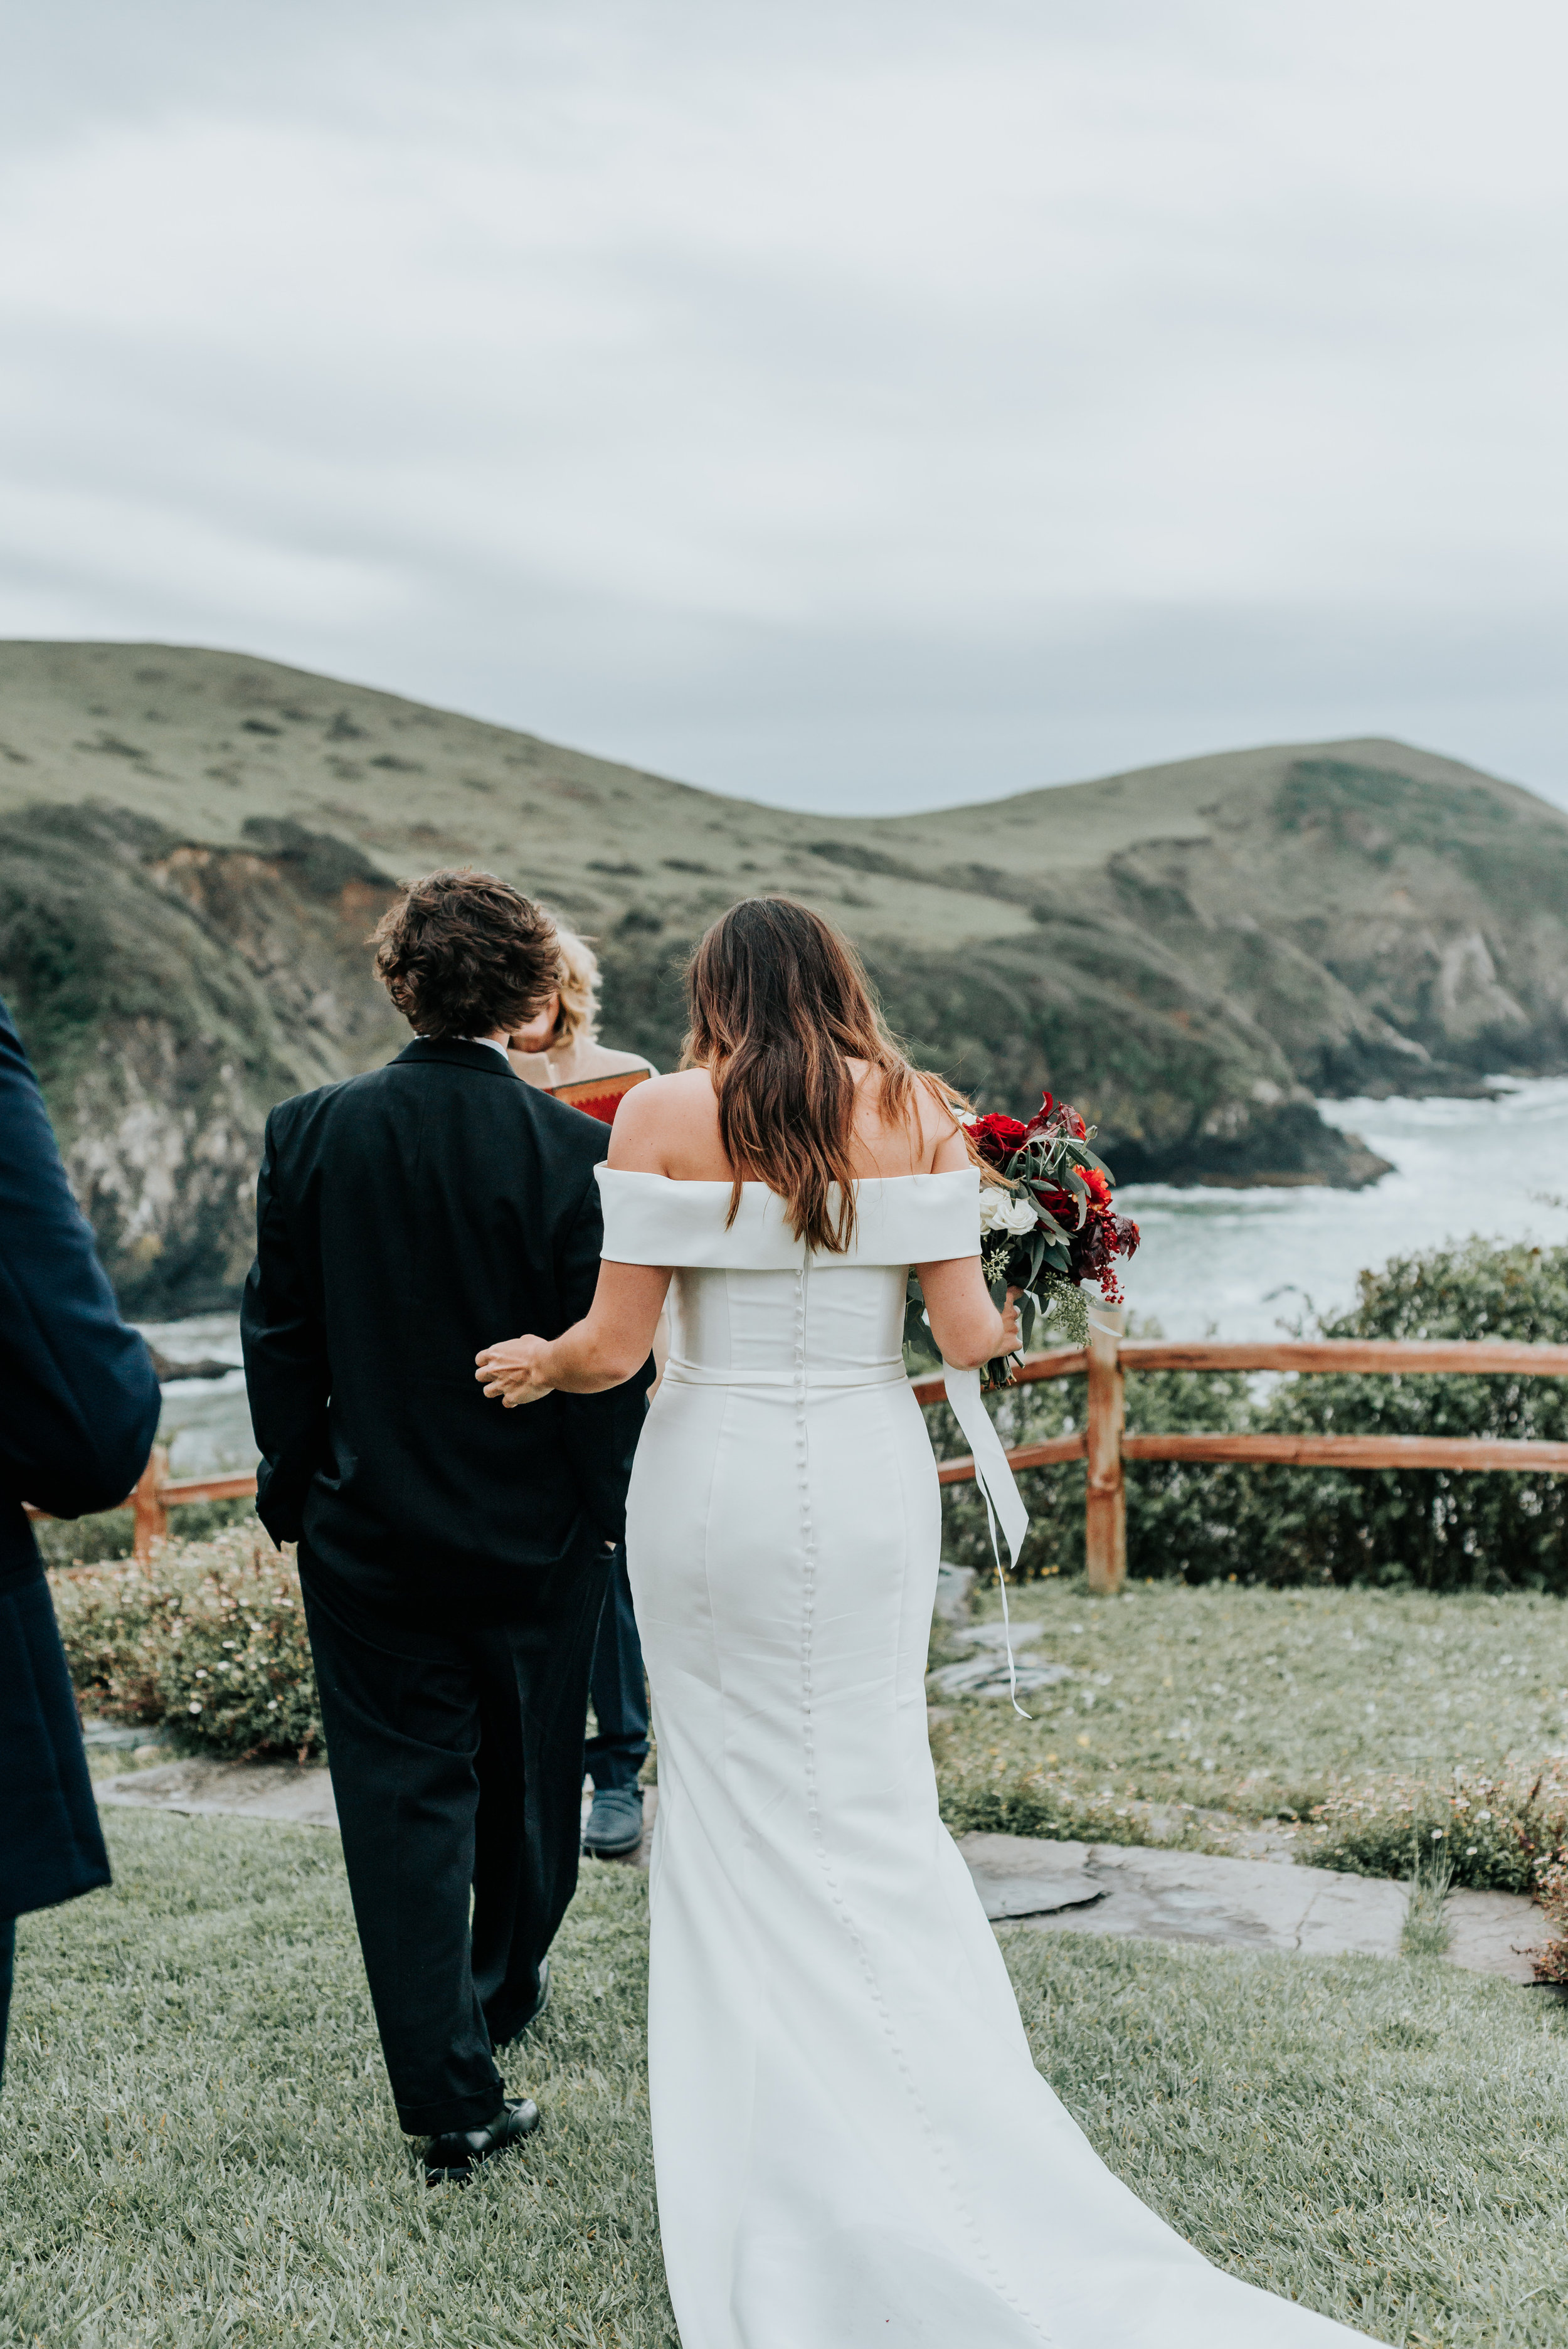 Albion River Inn Wedding in Albion Caliornia-56.jpg